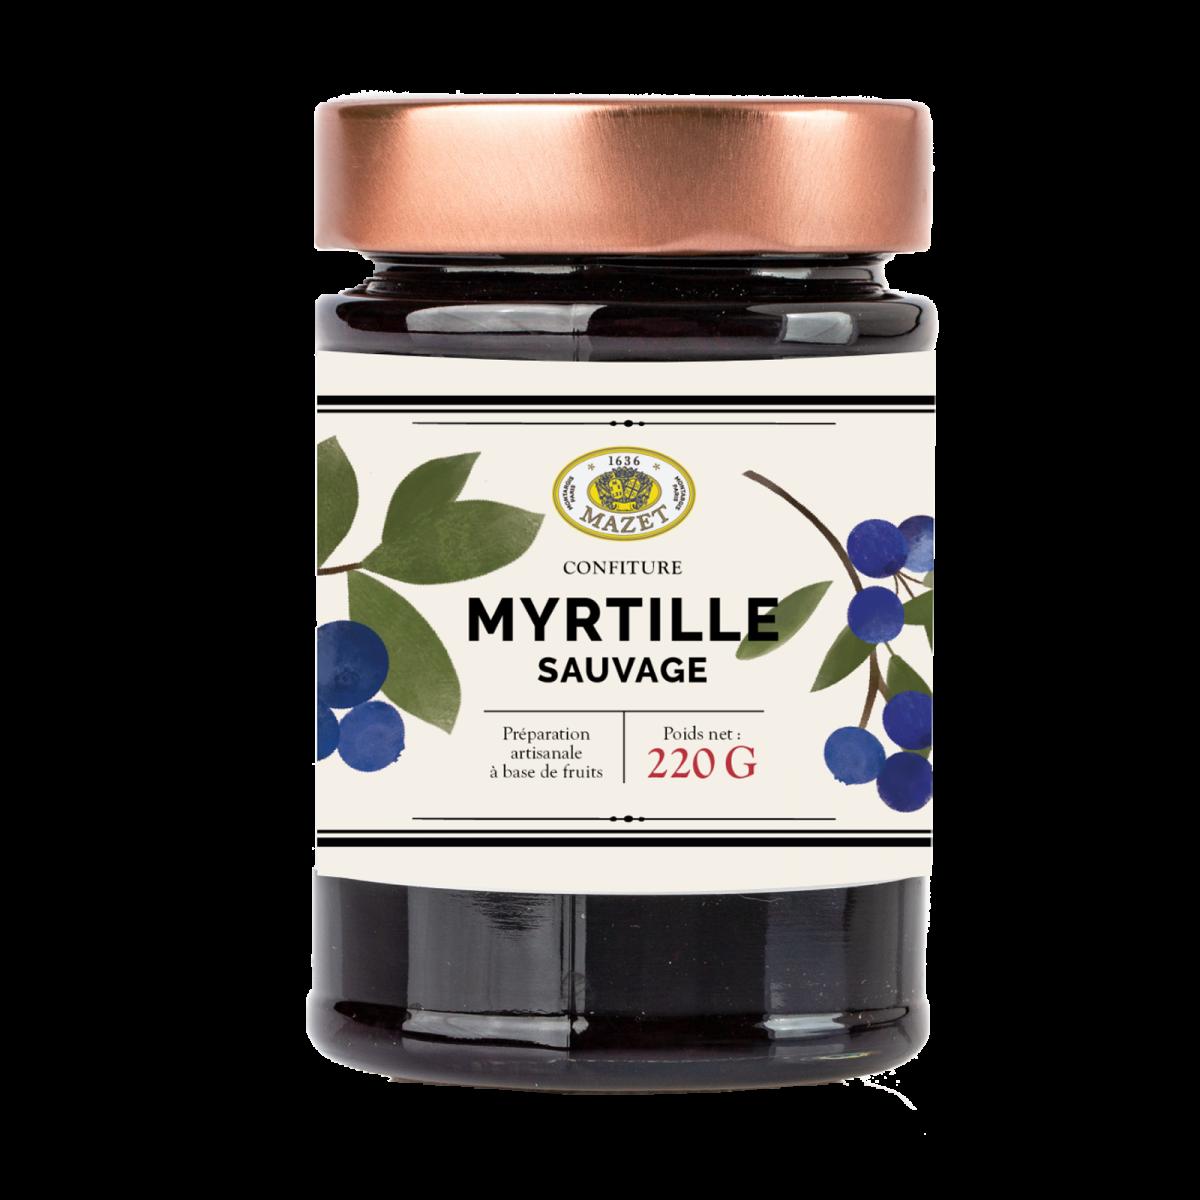 Confitures - Confiture myrtille sauvage 220g